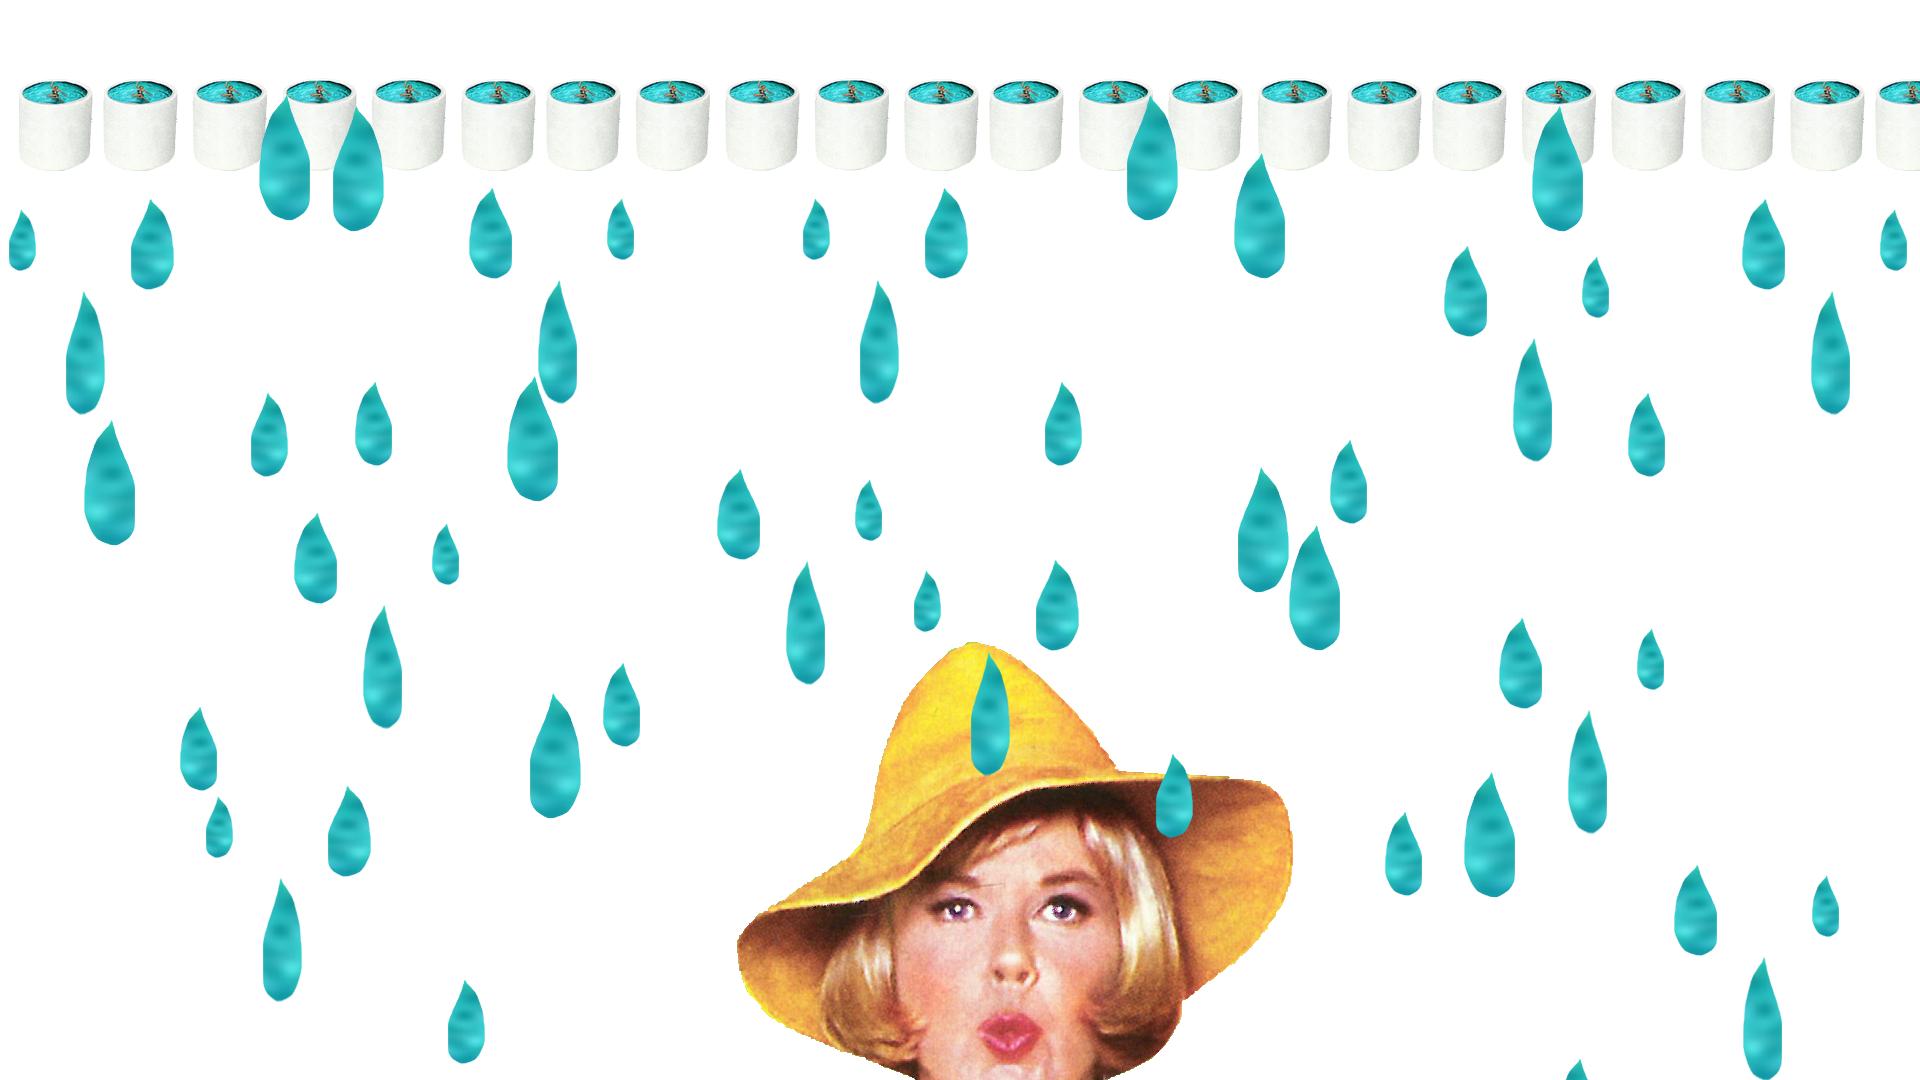 RainyDaysComp.png